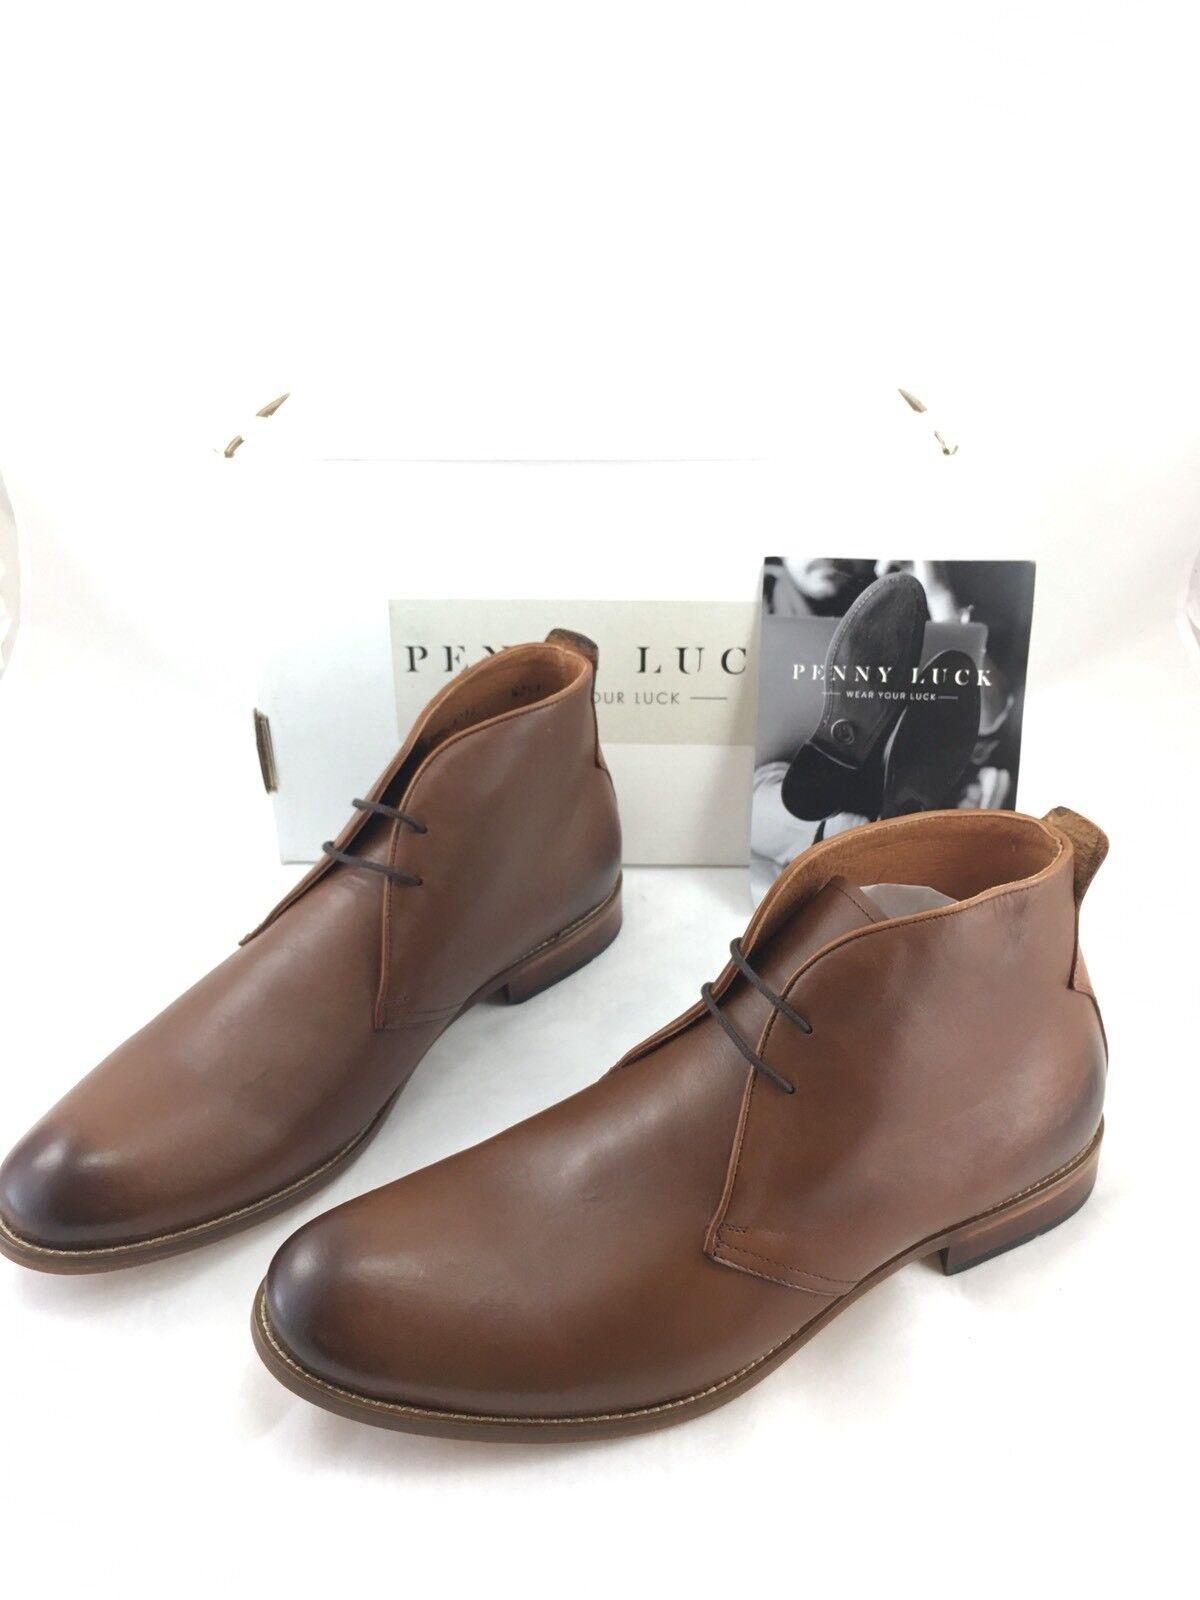 PENNY LUCK Shoe Co. Uomo Pelle Chukka Boot Chocolate Size 13